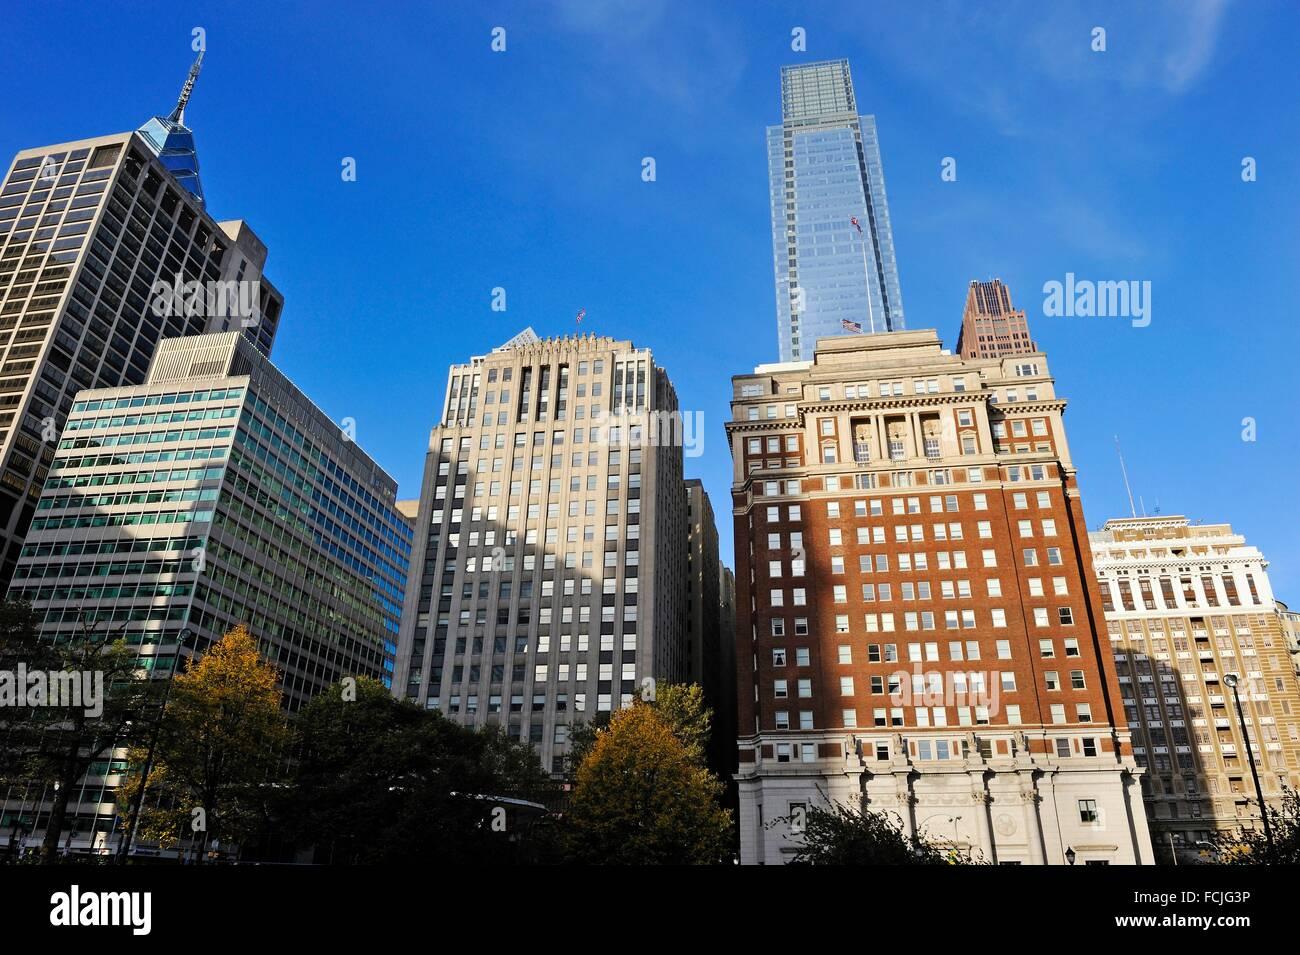 buildings around JFK Plaza, Downtown, Philadelphia, Commonwealth of Pennsylvania, Northeastern United States,. - Stock Image